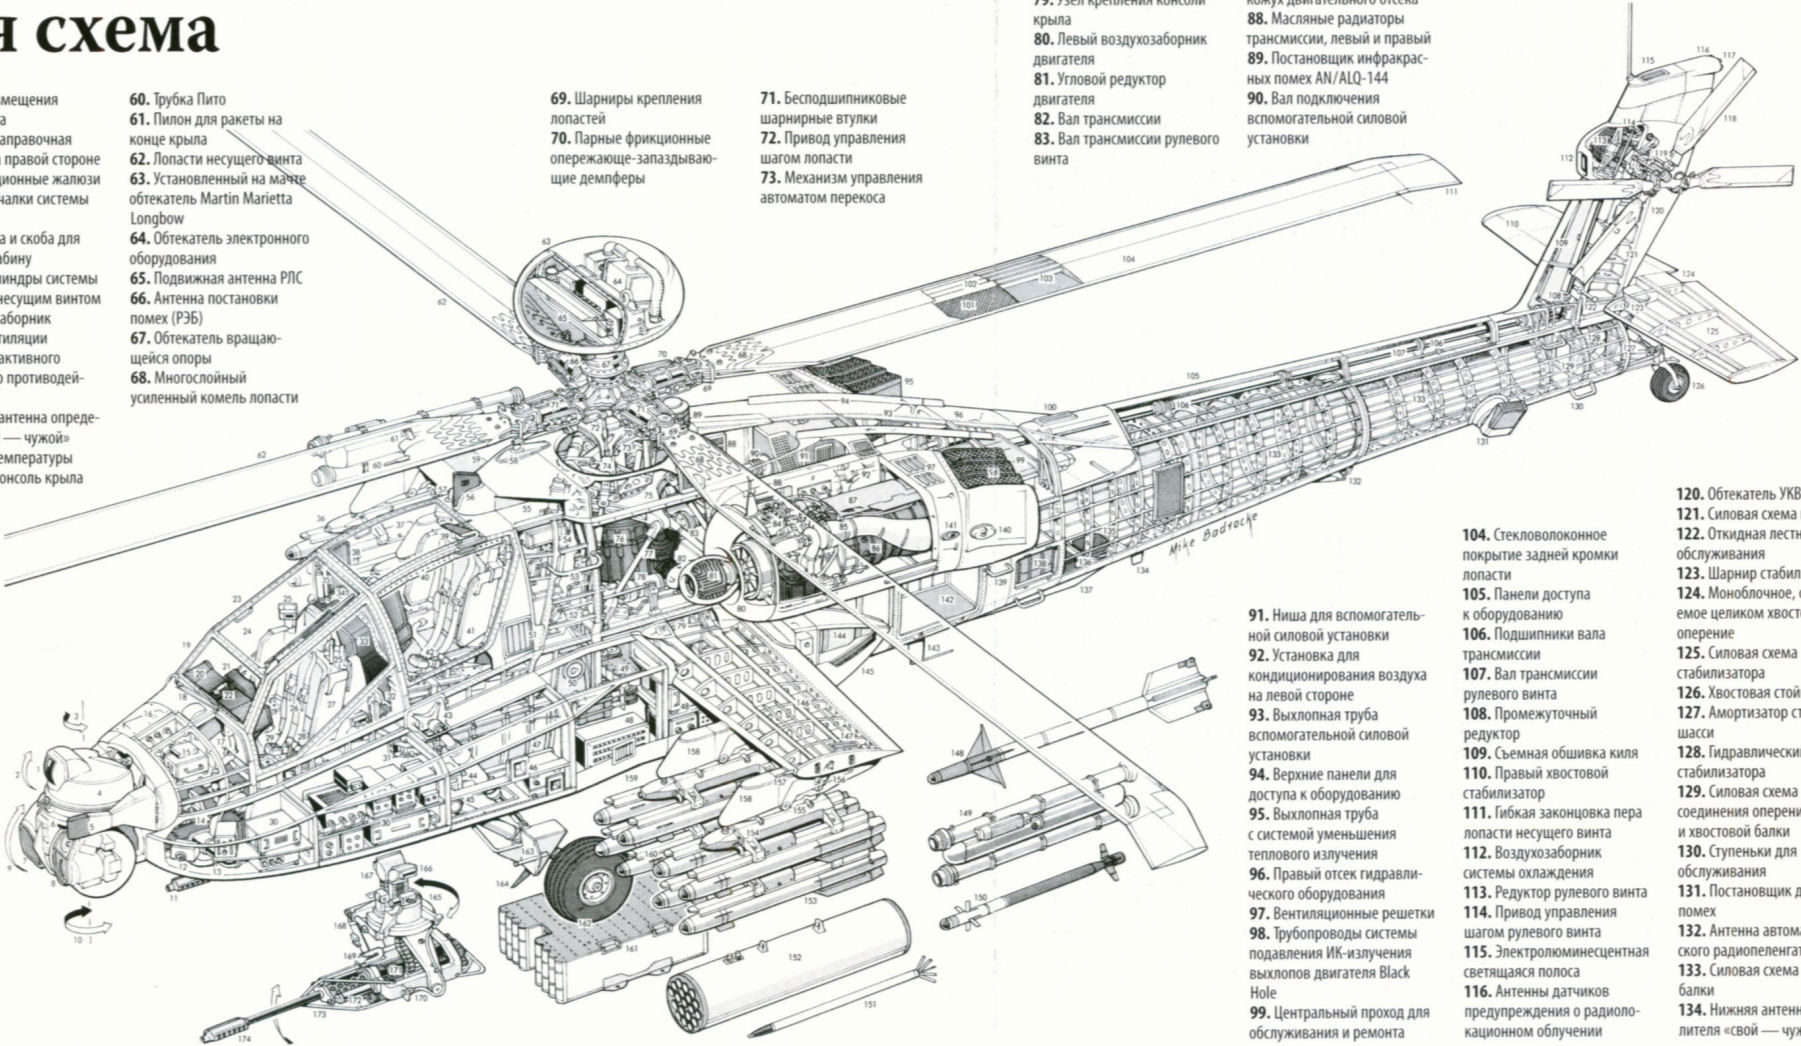 http://aviadejavu.ru/Images6/MM/MM-05/0481-05-5-1.jpg